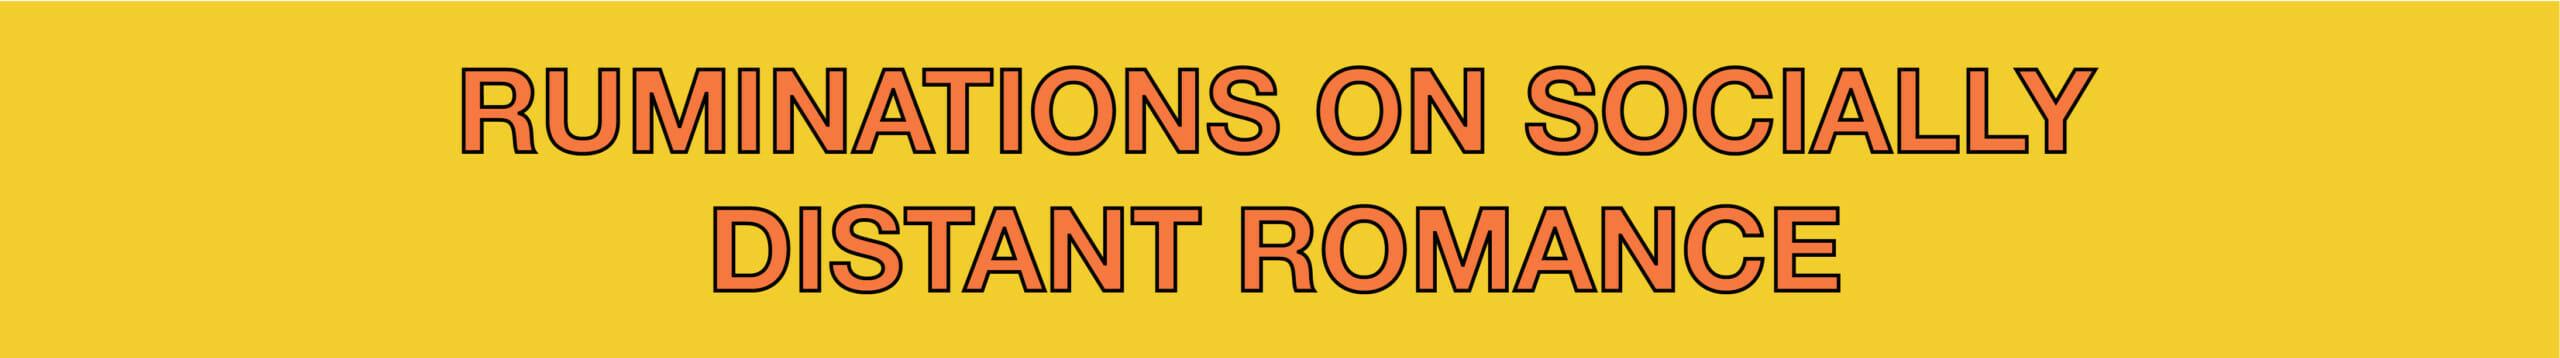 Ruminations on socially distant romance